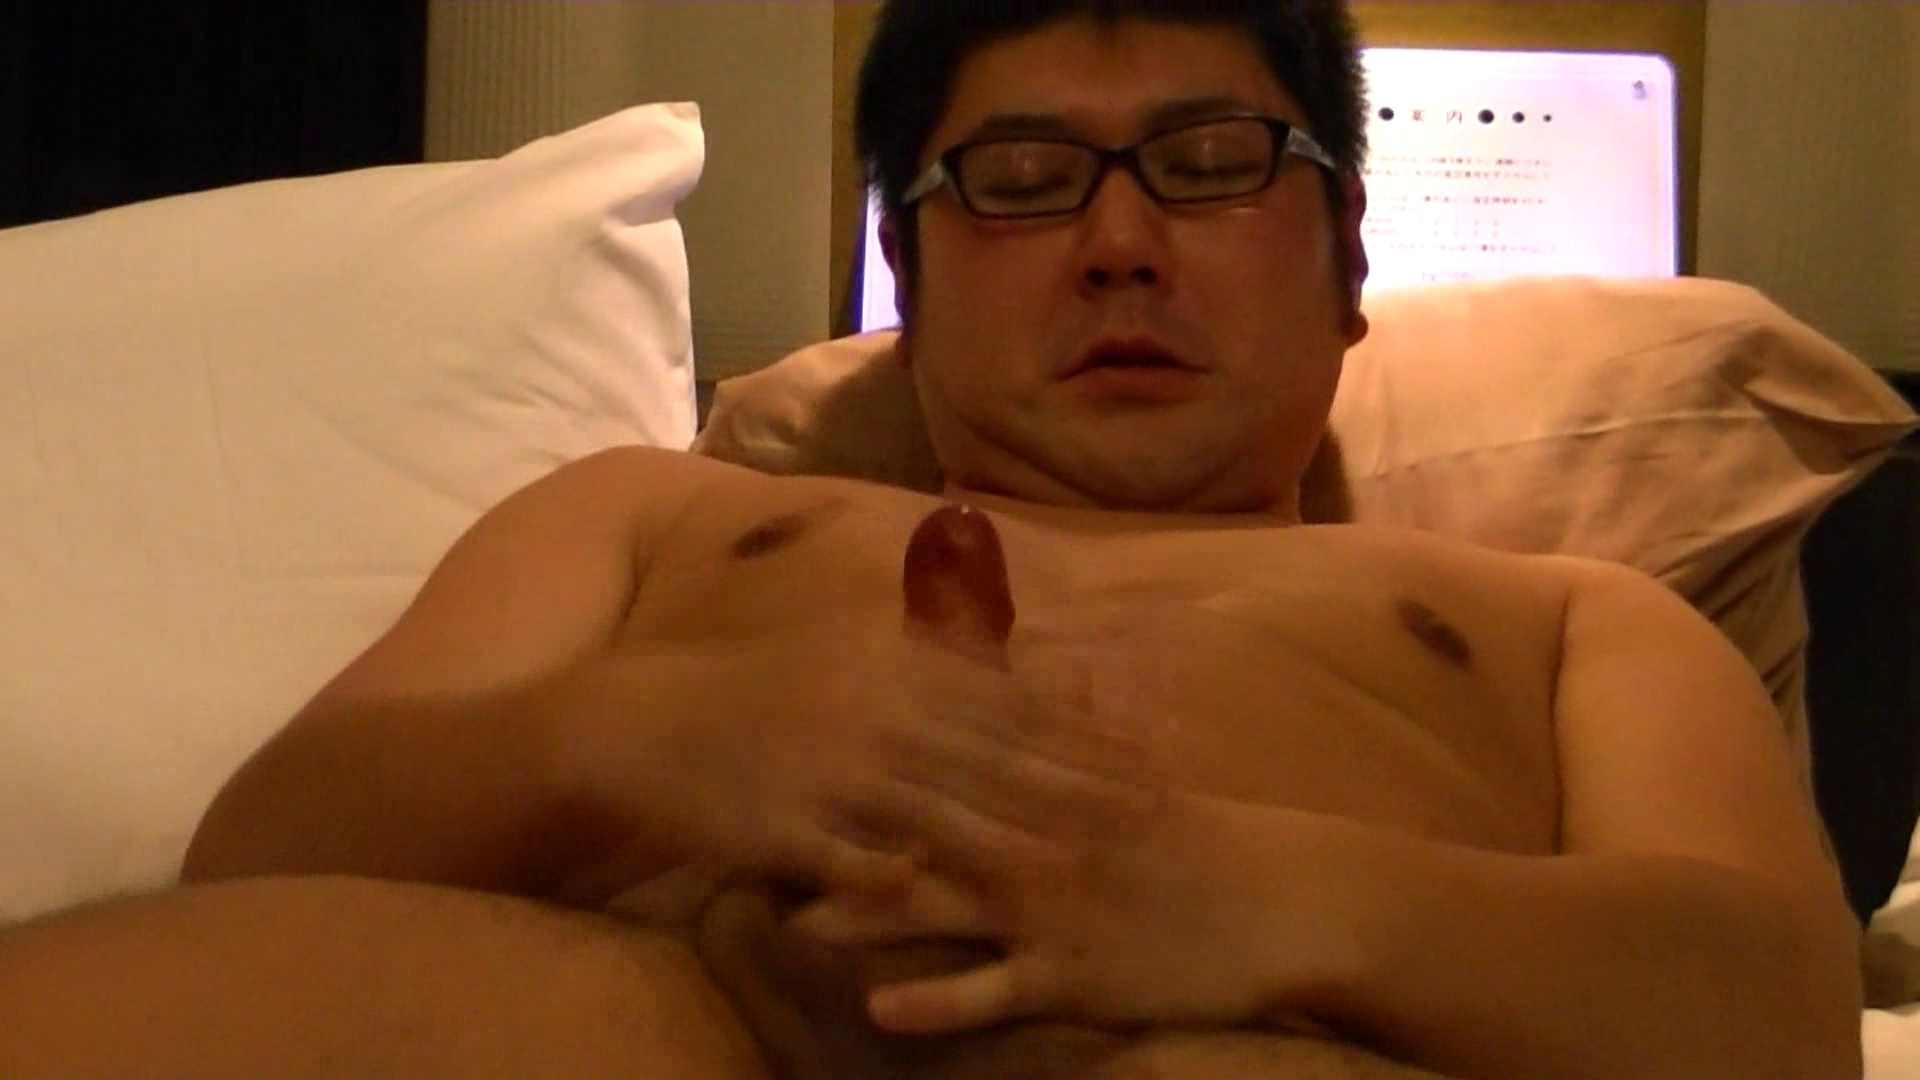 Mr.オナックスさん投稿!HD 貴方のオナニー三万円で撮影させてください。VOL.03 後編 完全無修正版 | ガチムチマッチョ系男子  106枚 97